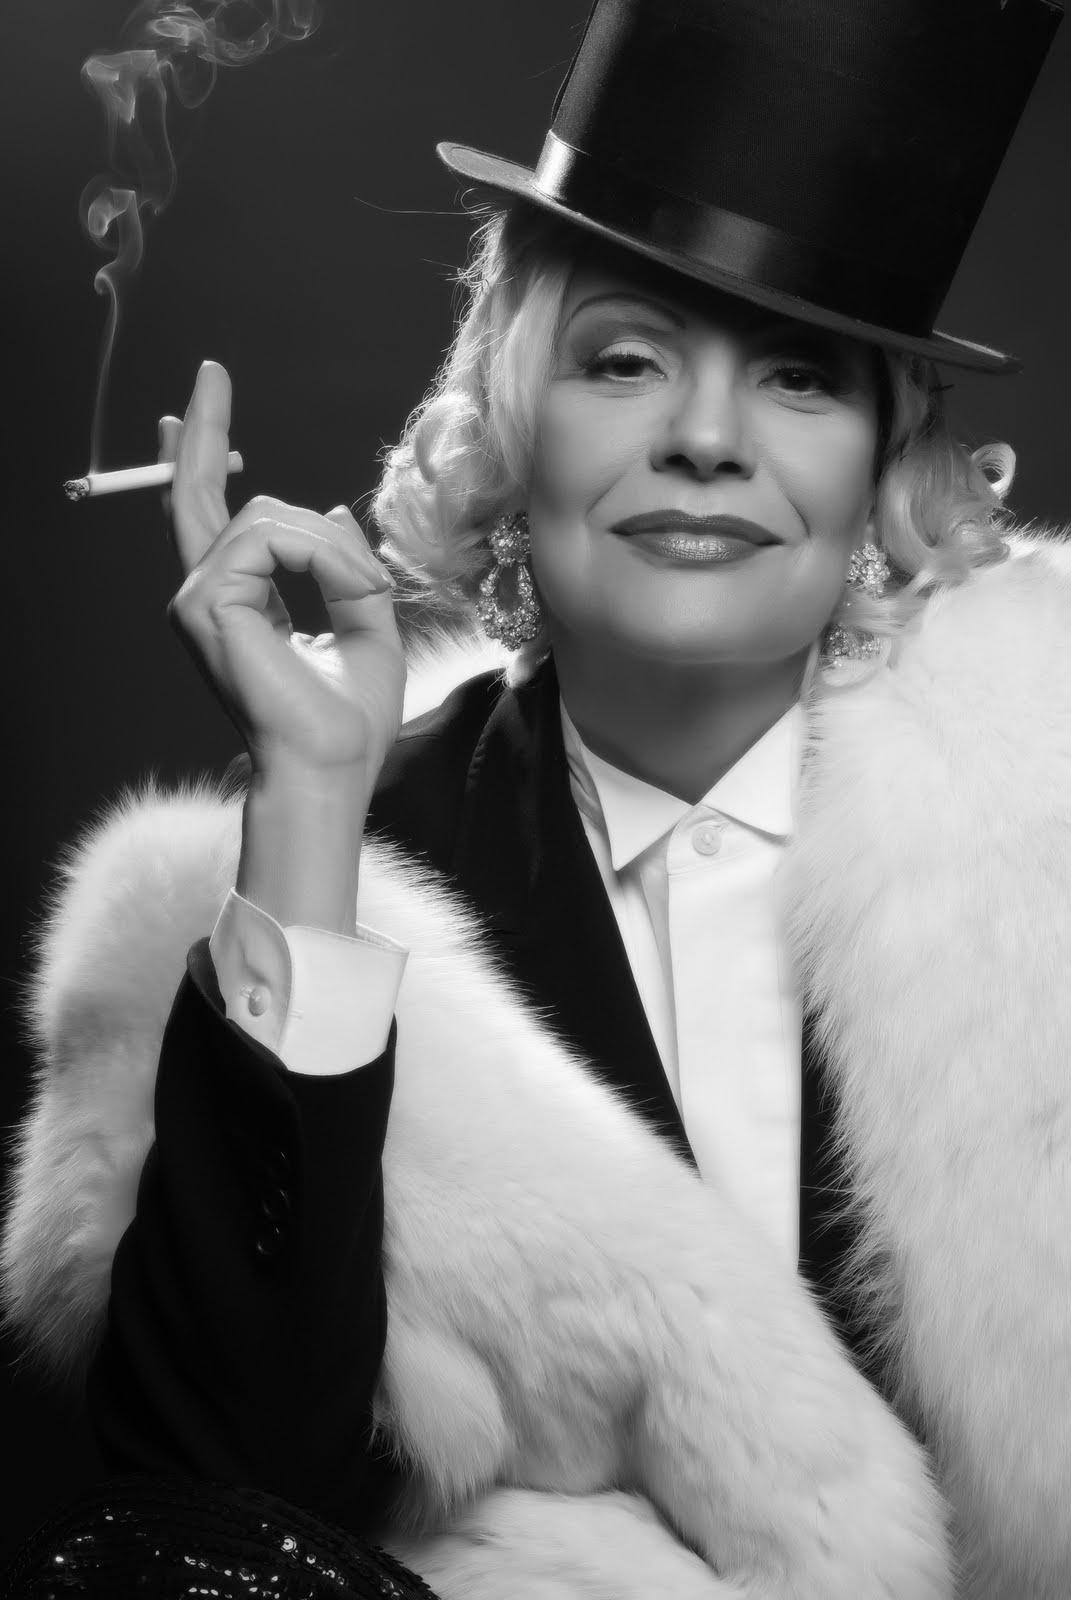 Marlene Dietrich - Wallpapers